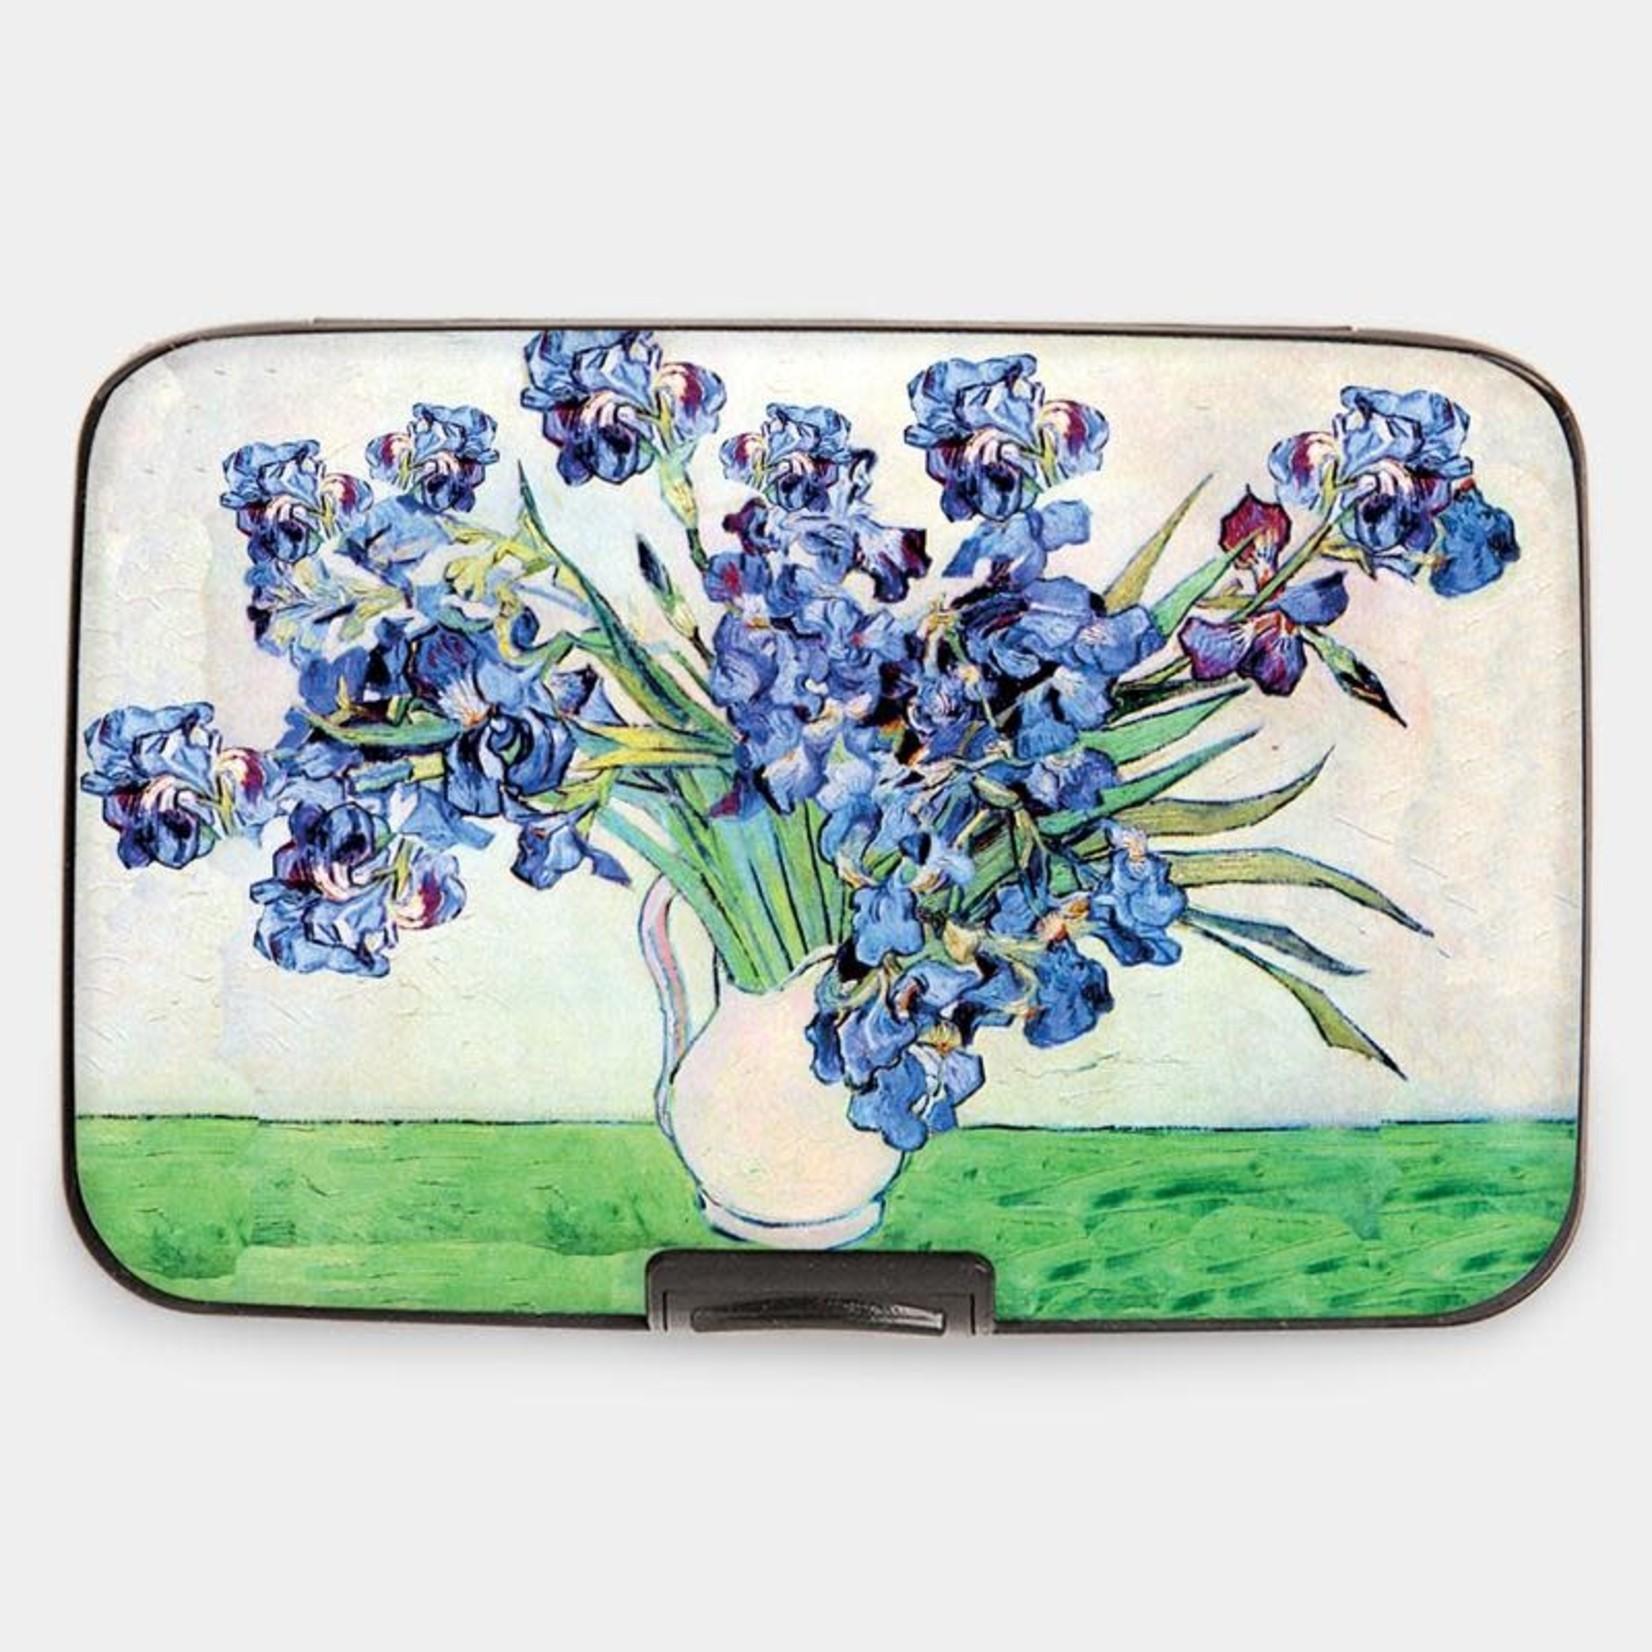 Monarque Armored Wallet - Van Gogh - Irises in Vase